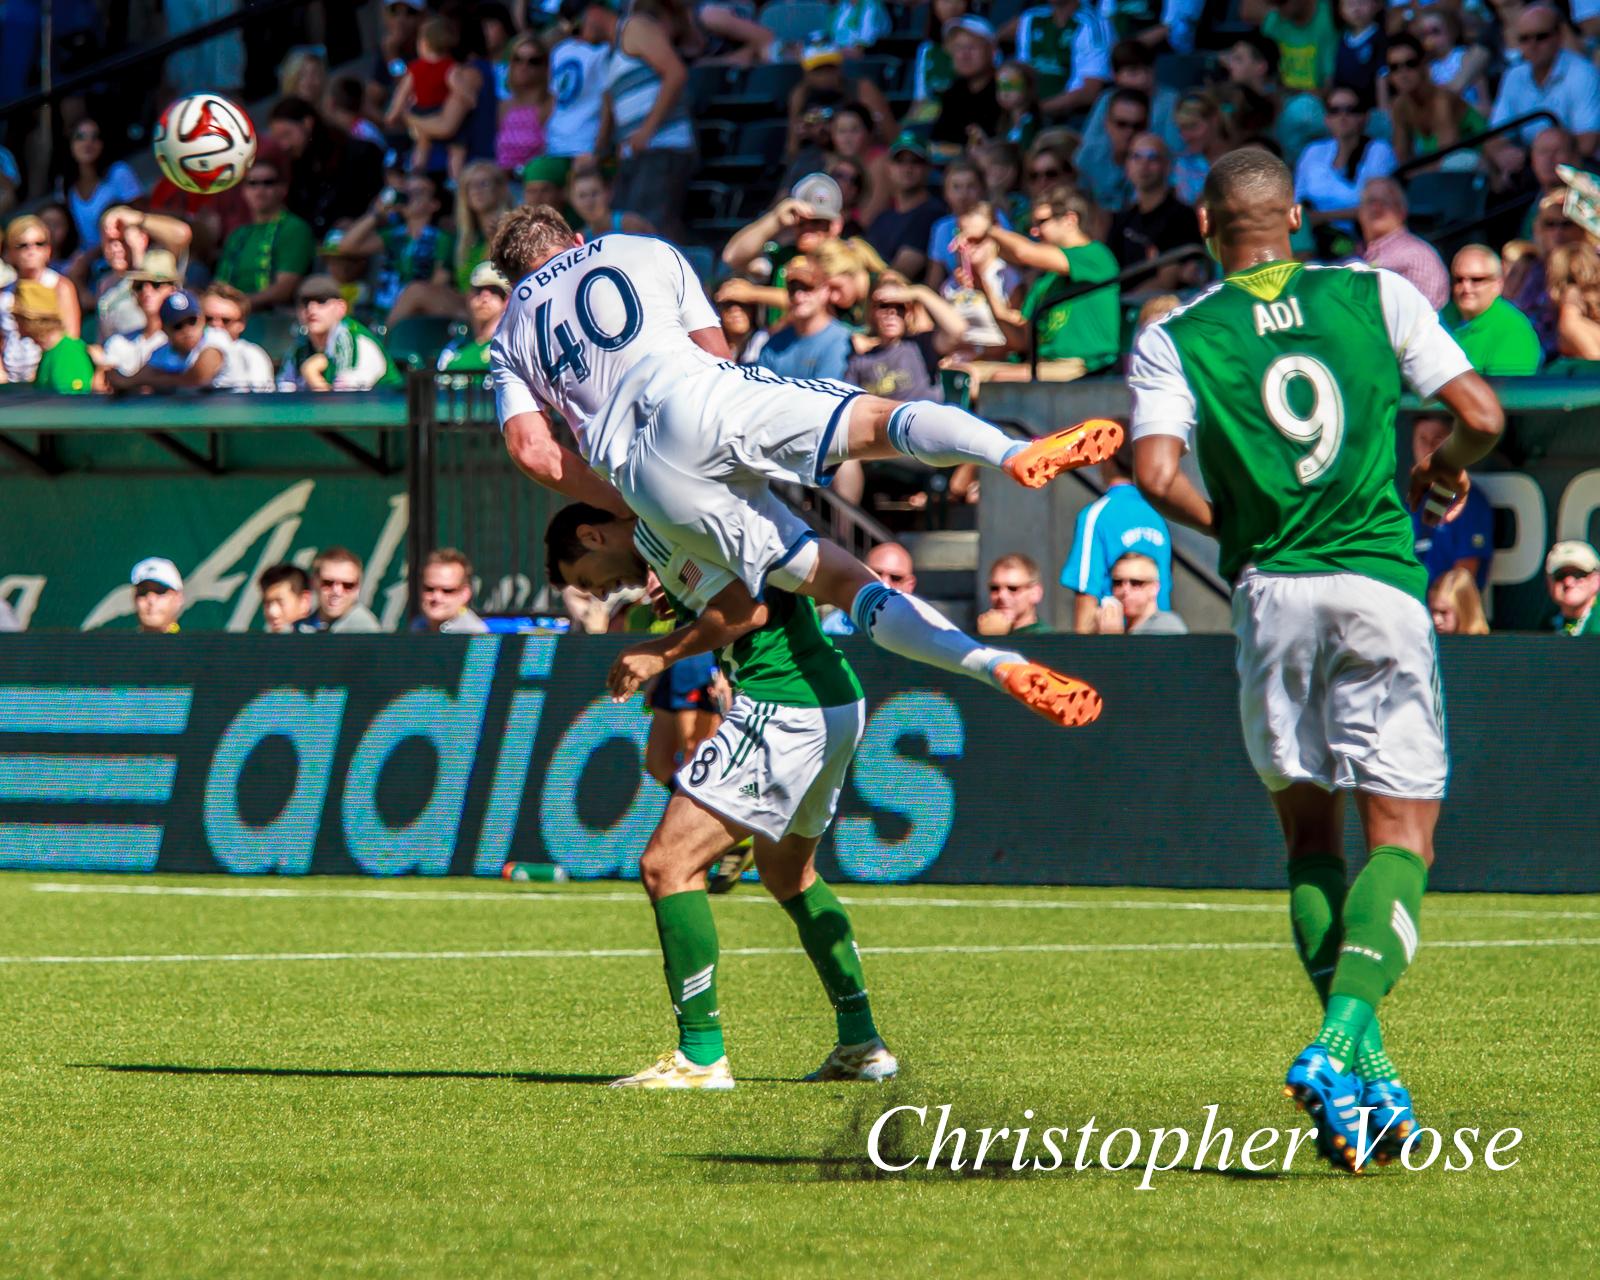 2014-09-20 Andy O'Brien, Diego Valeri, and Fanendo Ad.jpg